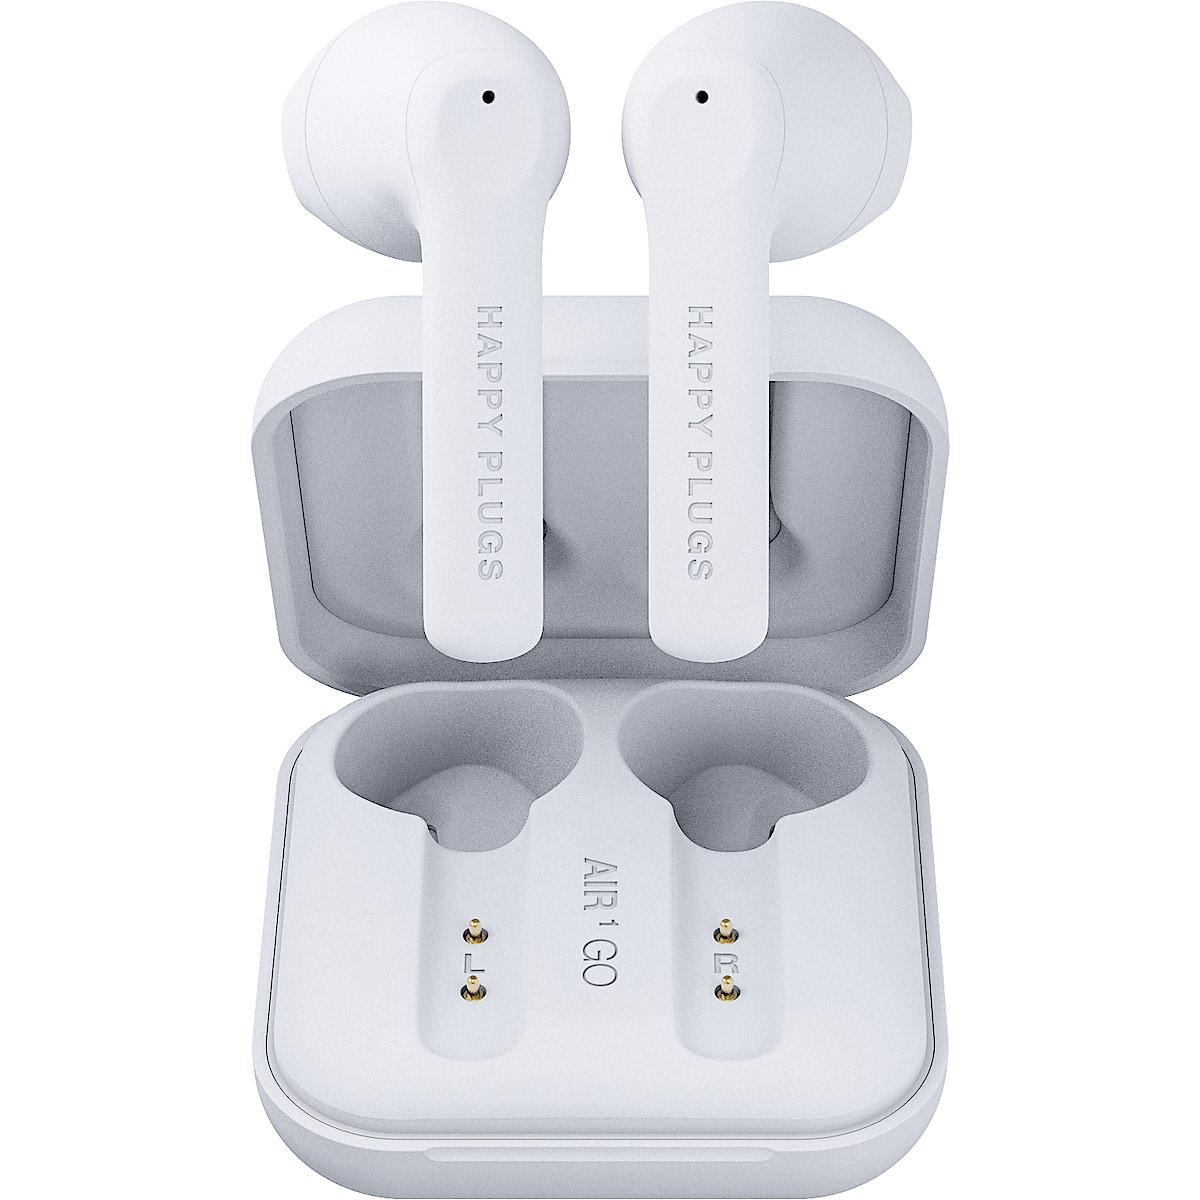 Happy Plugs Air 1 Go, True Wireless, trådlösa hörlurar